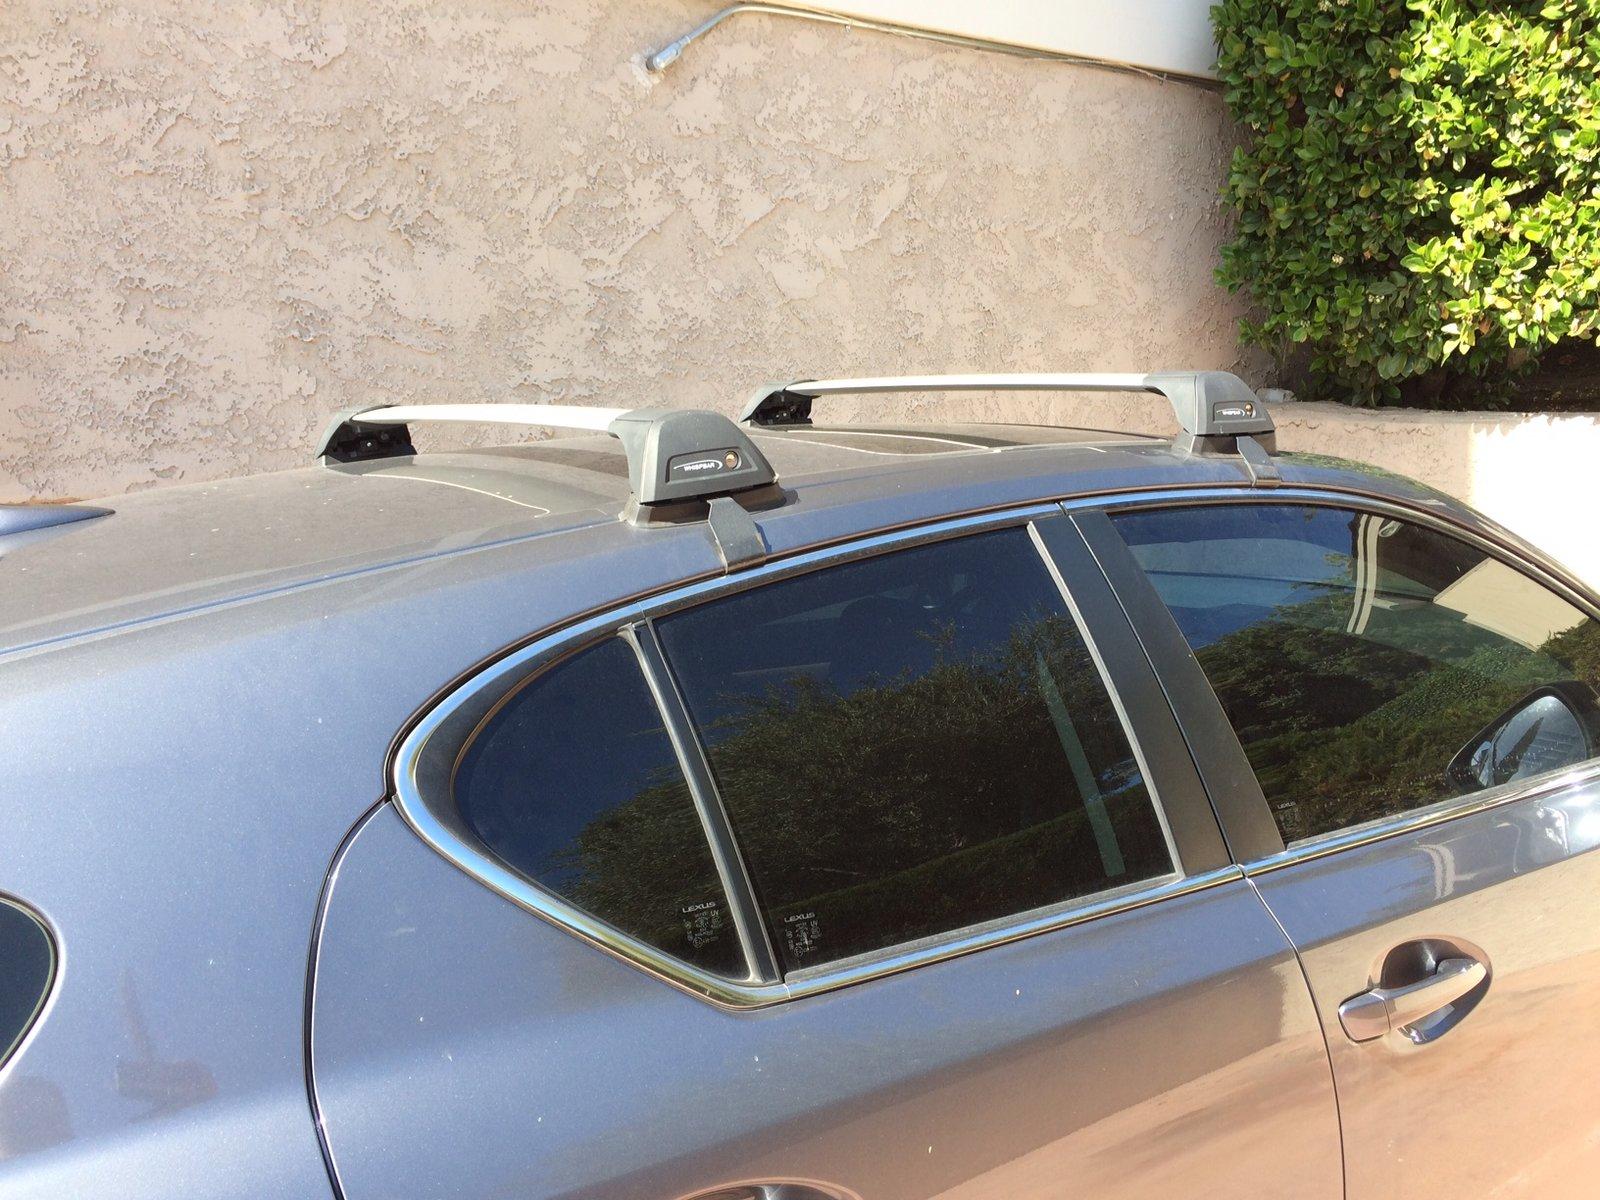 Yakima Whispbar Roof Rack For Lexus Ct200h Imtbtrails